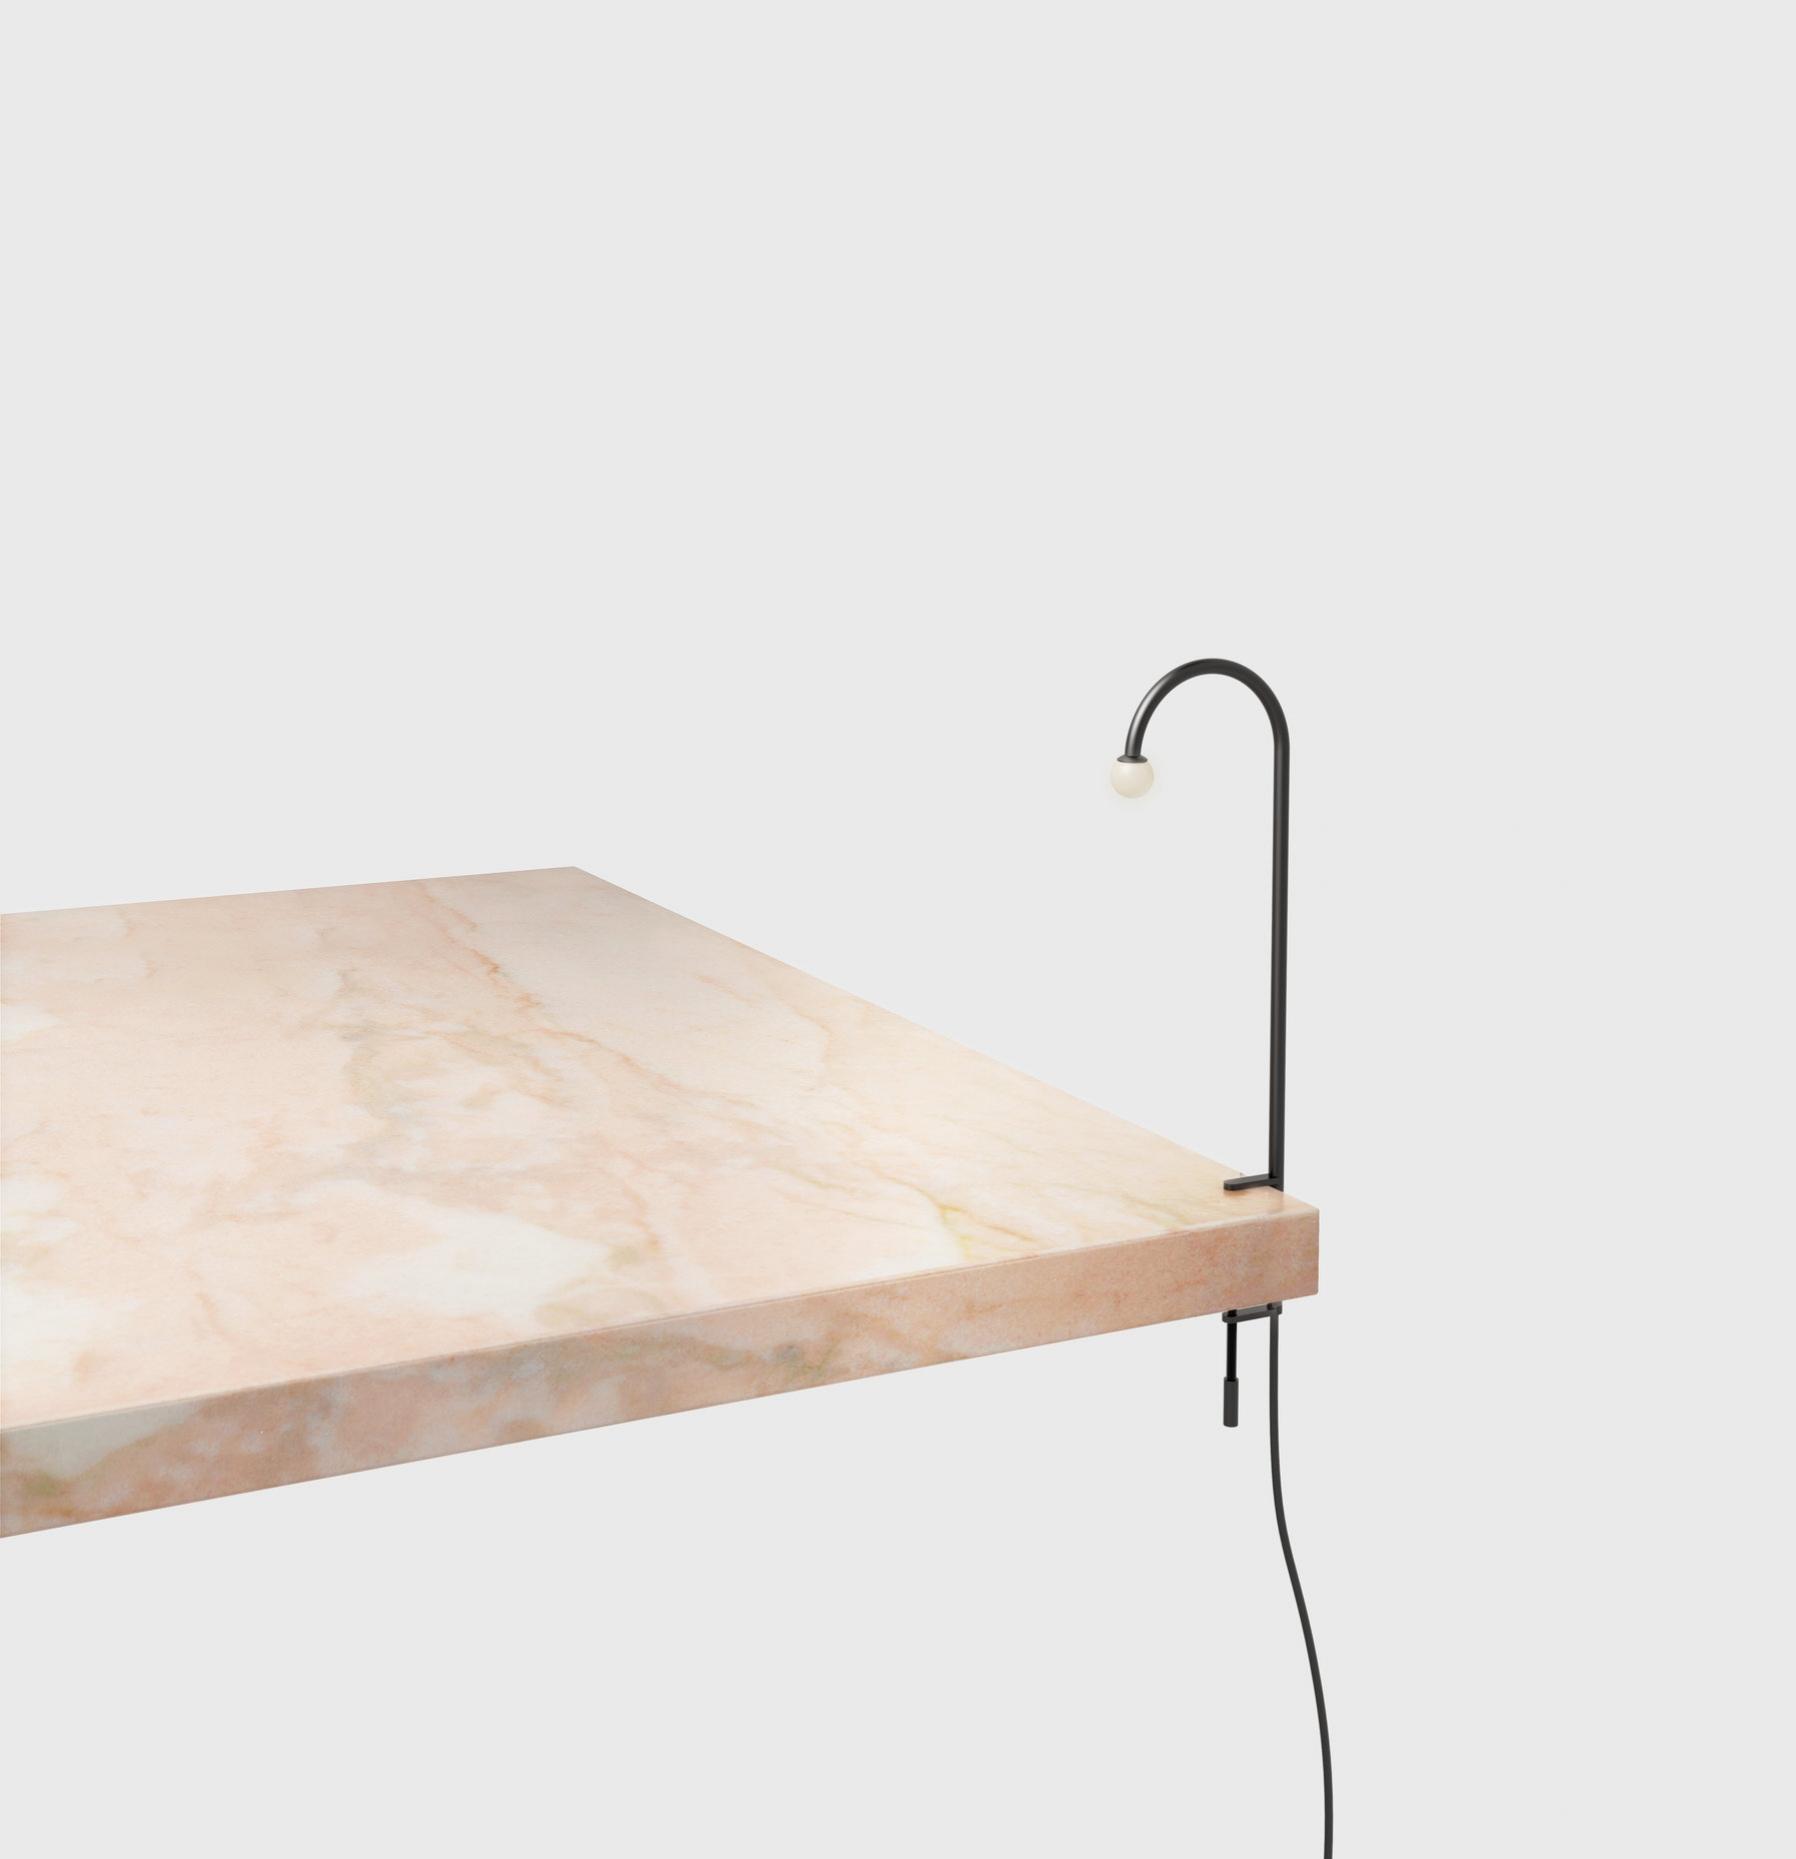 Arca Desk Clamp Lamp